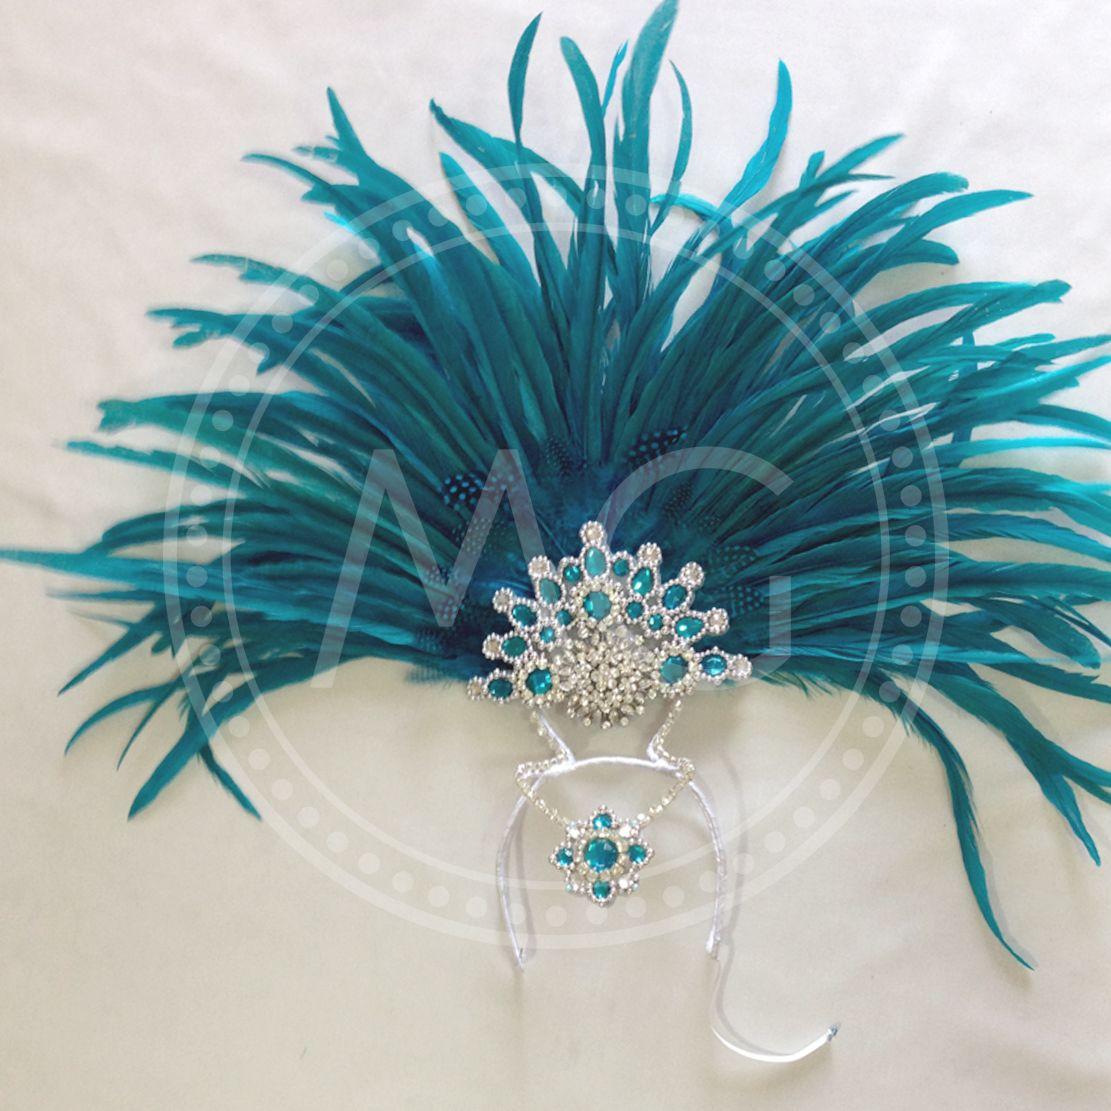 Mermaid Headdress Samba Costume by Miss Glamurosa Costumes